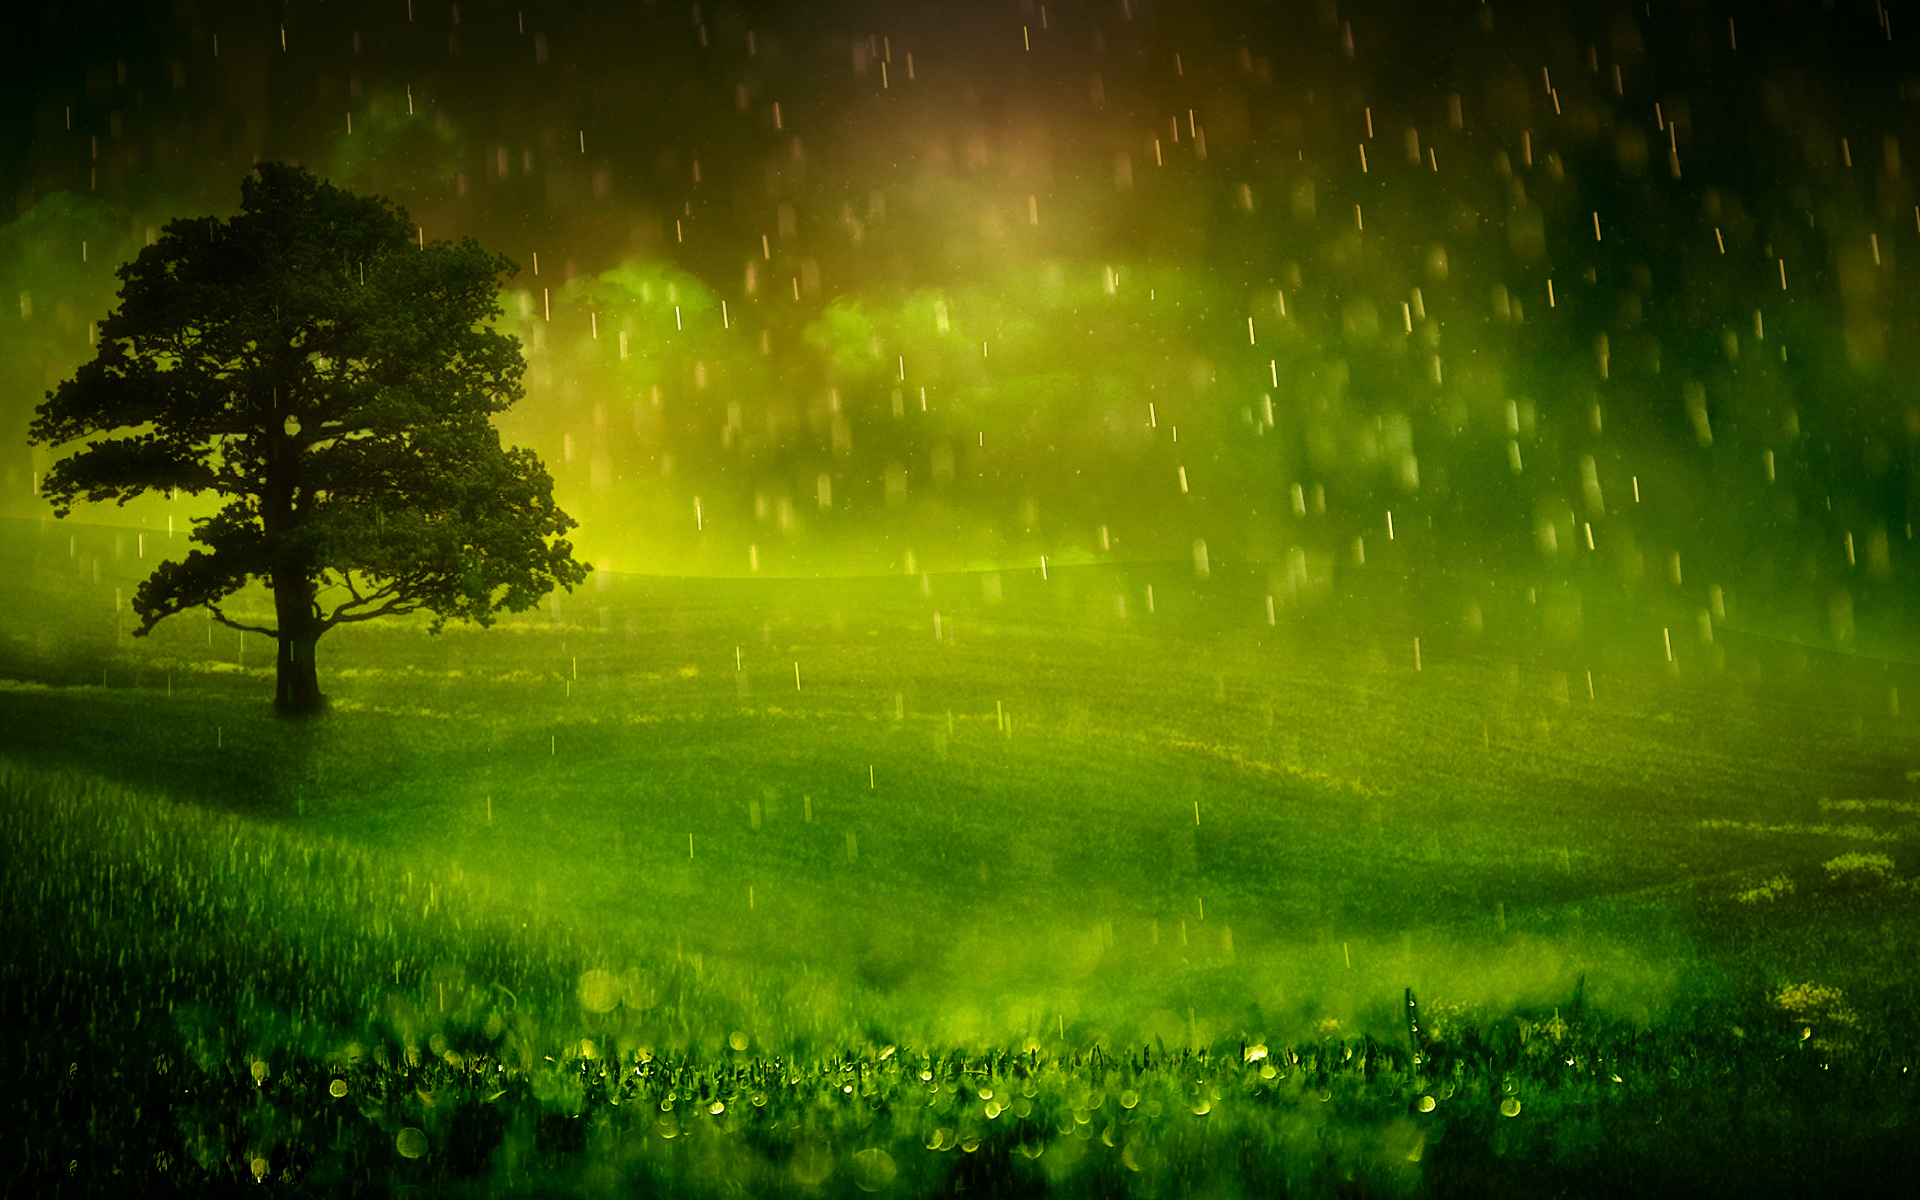 Nature Rain Wallpaper